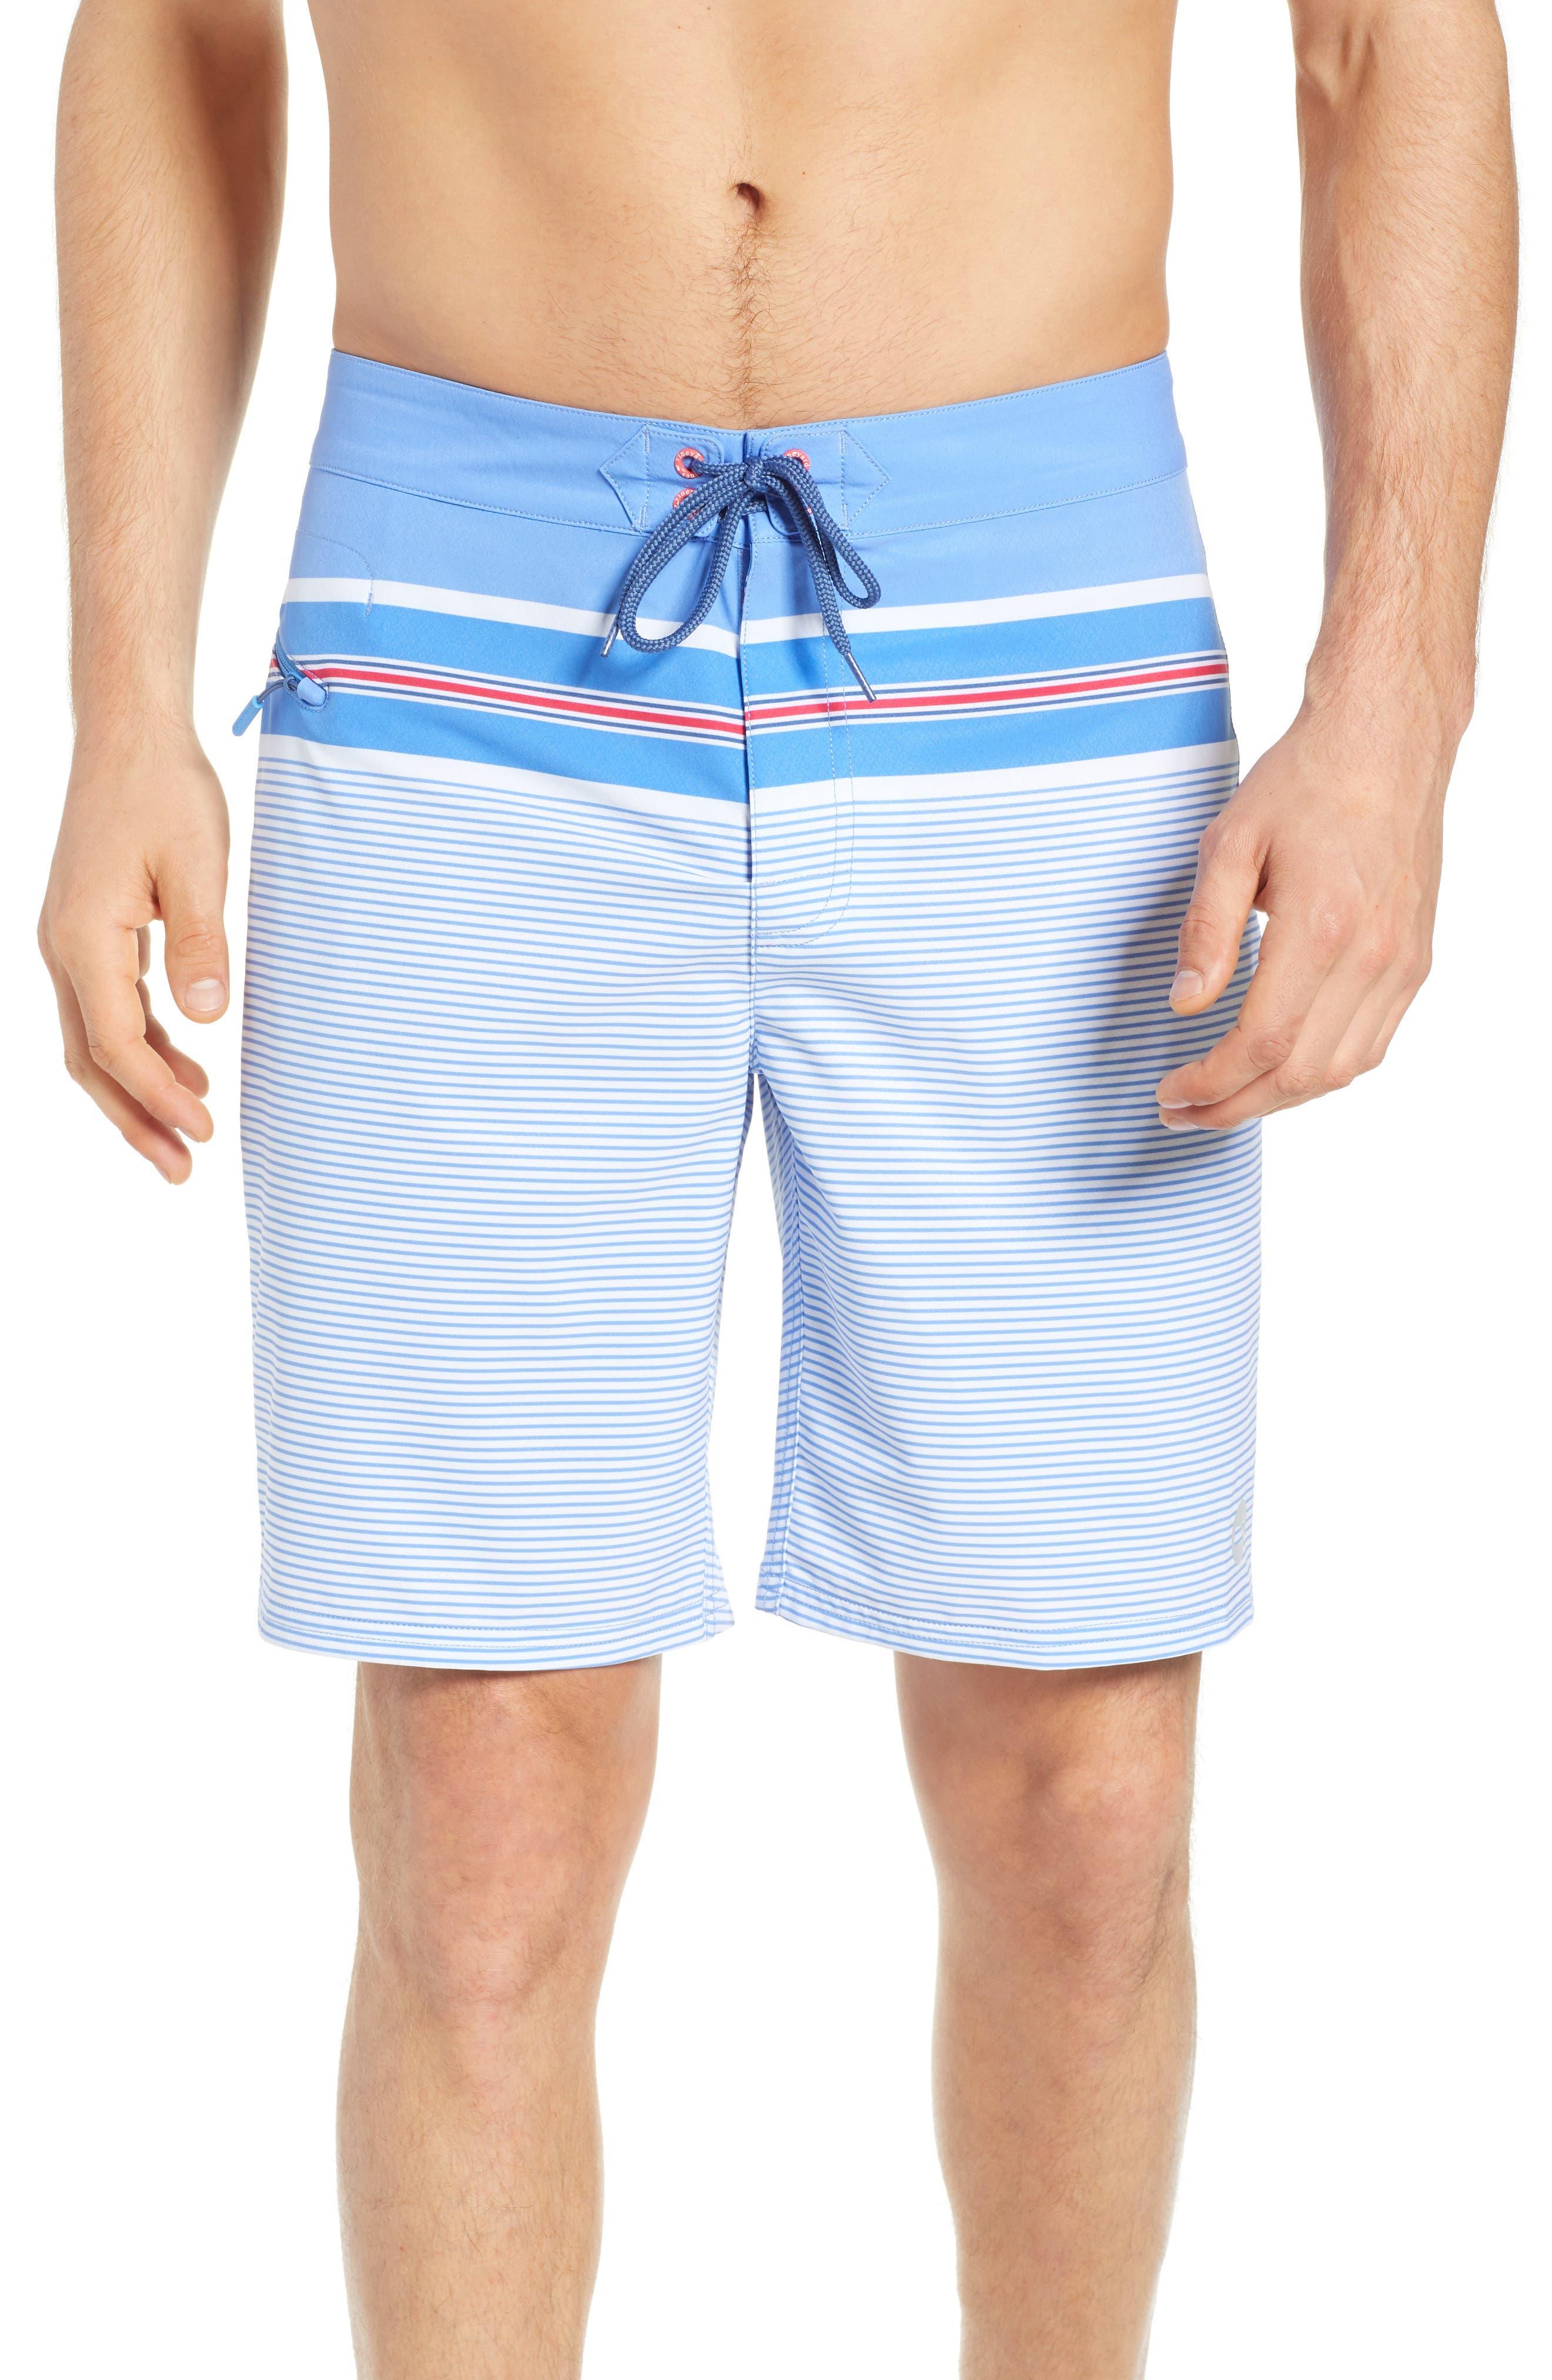 VINEYARD VINES,                             Birchcliff Stripe Board Shorts,                             Main thumbnail 1, color,                             484